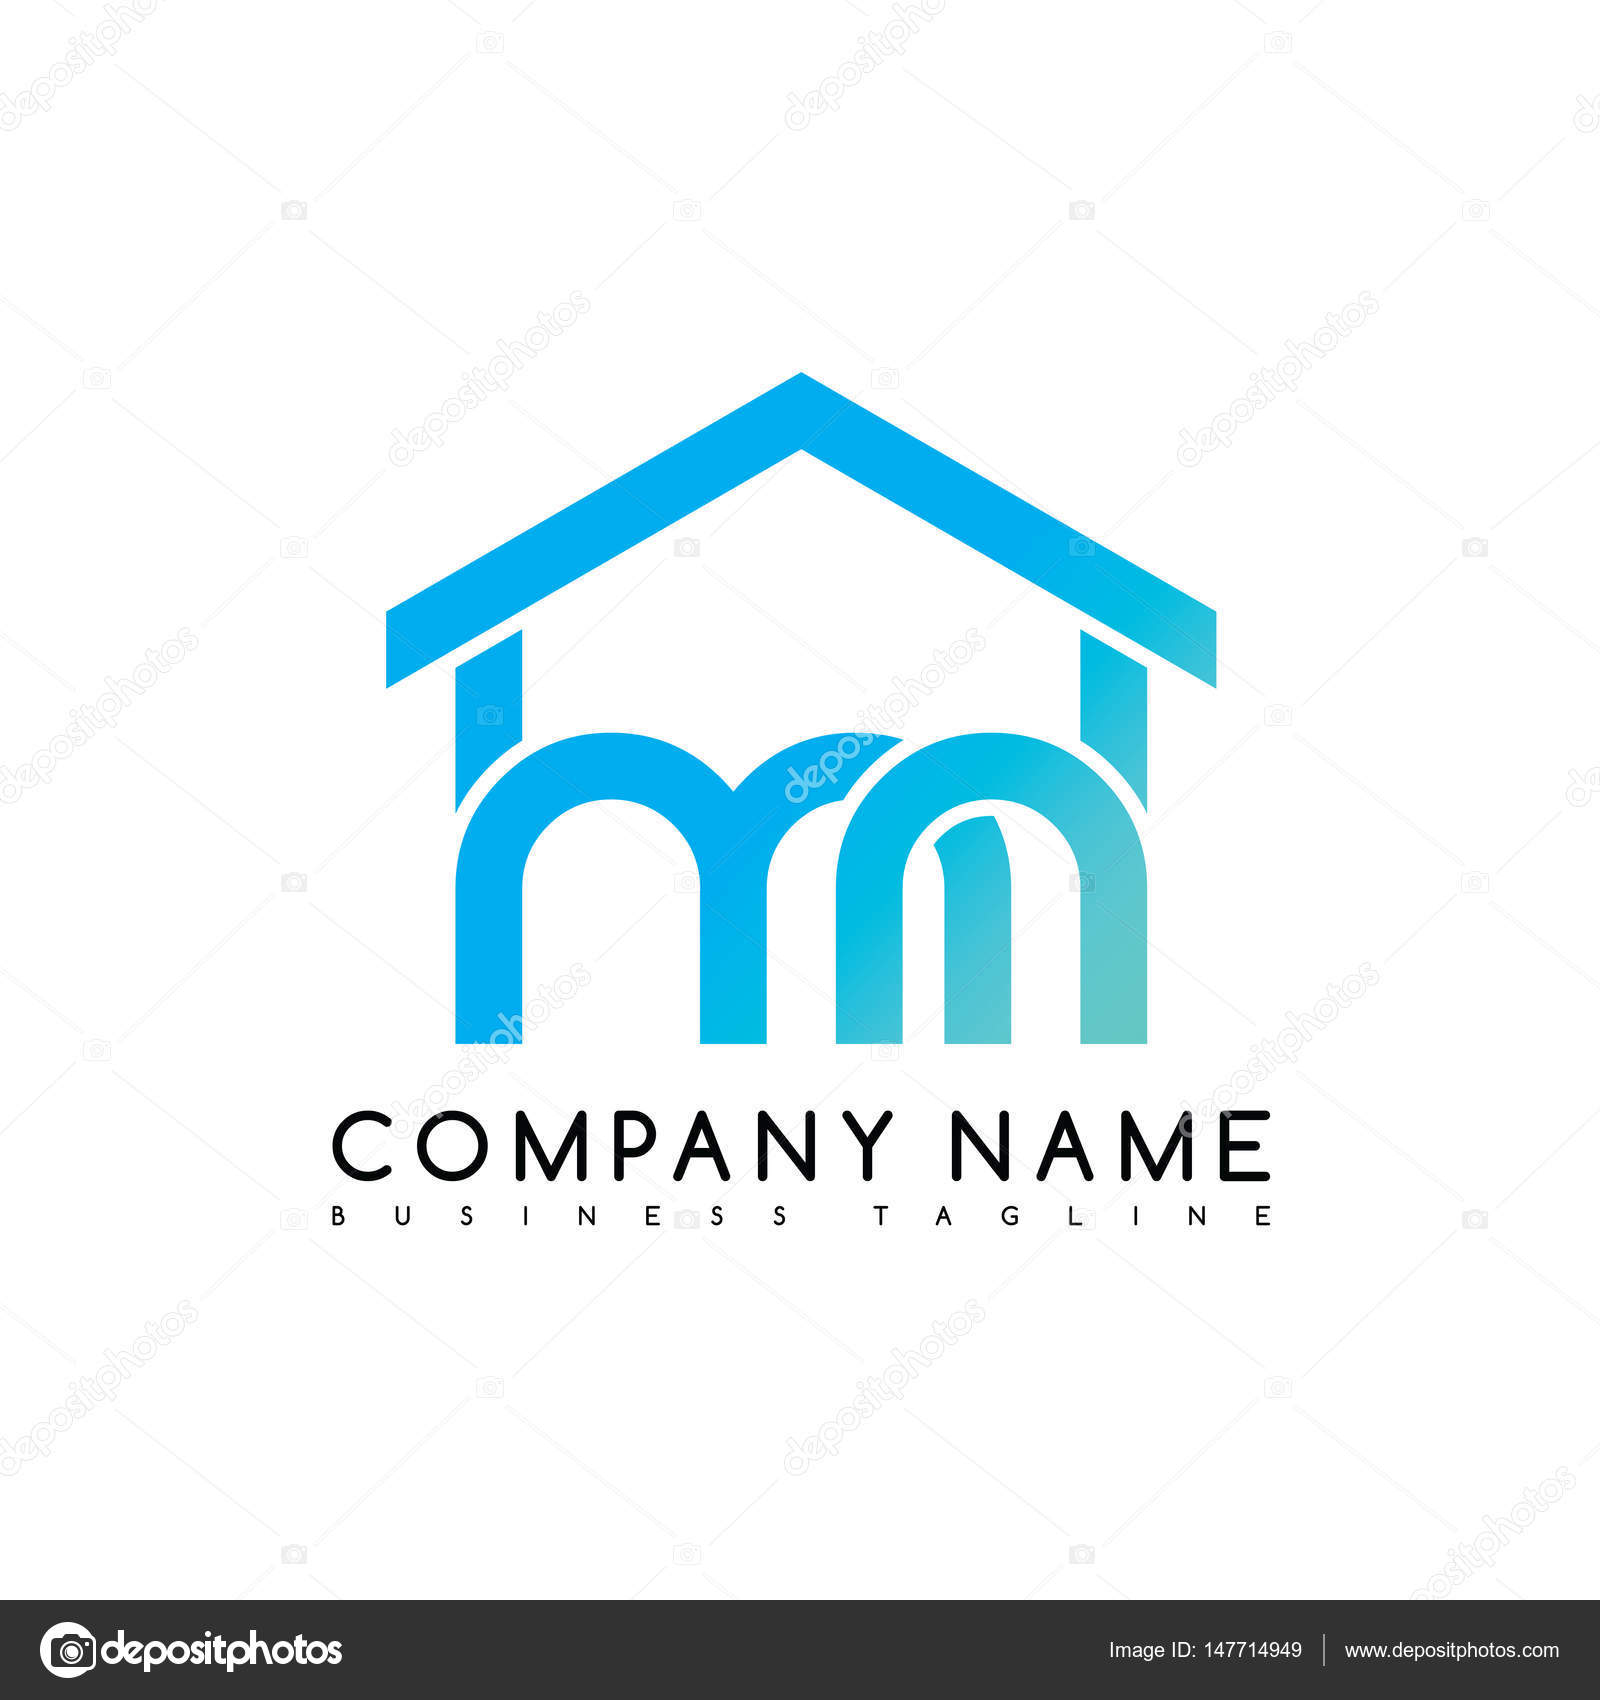 Company name business tagline stock vector vectorfirst 147714949 company name business tagline stock vector buycottarizona